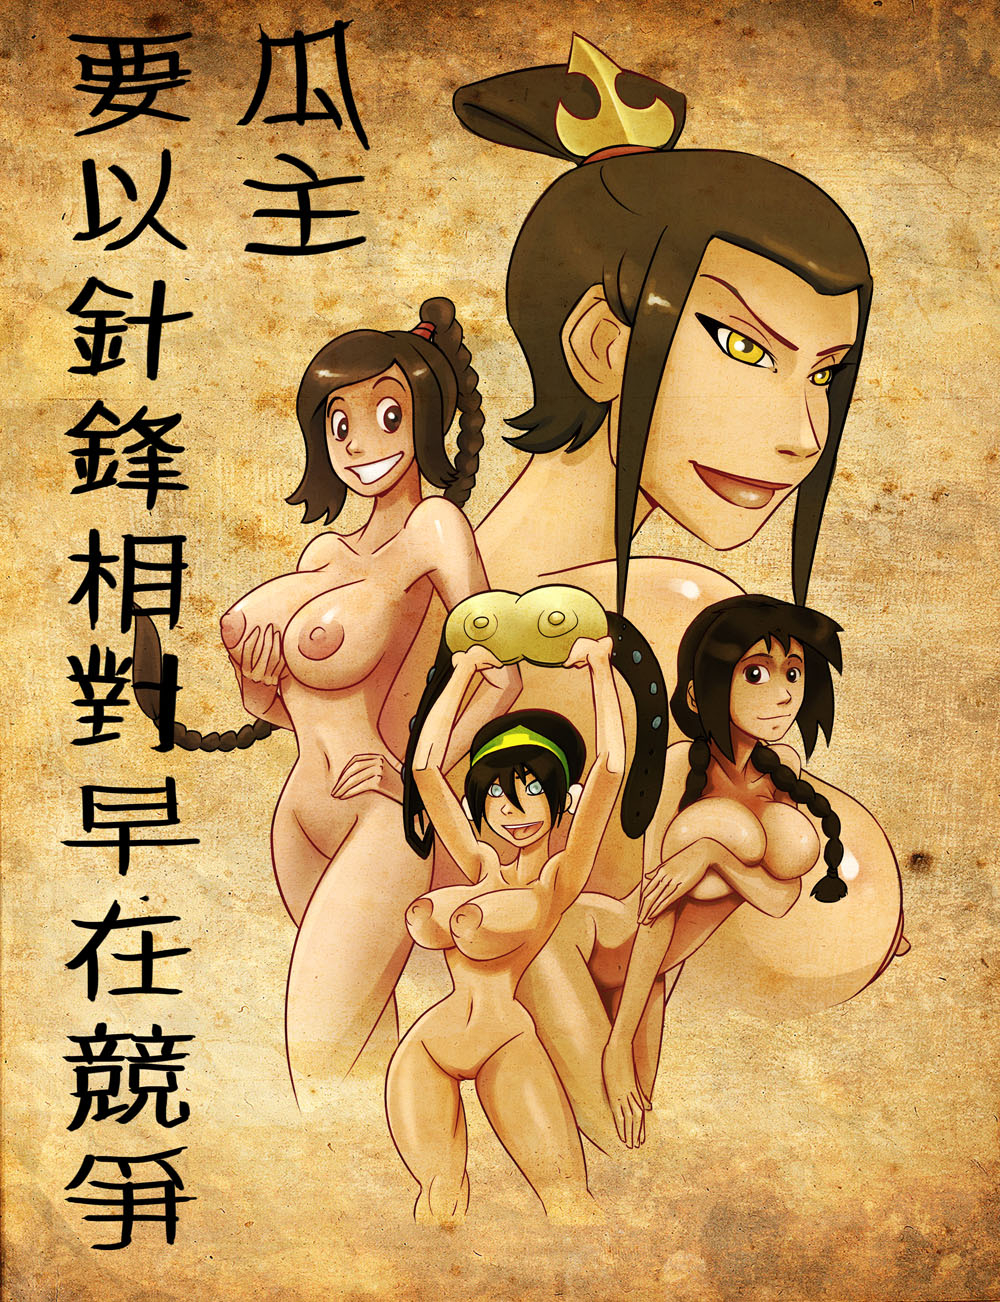 porn last the avatar airbender toph Tai-mado gakuen 35 shiken shotai